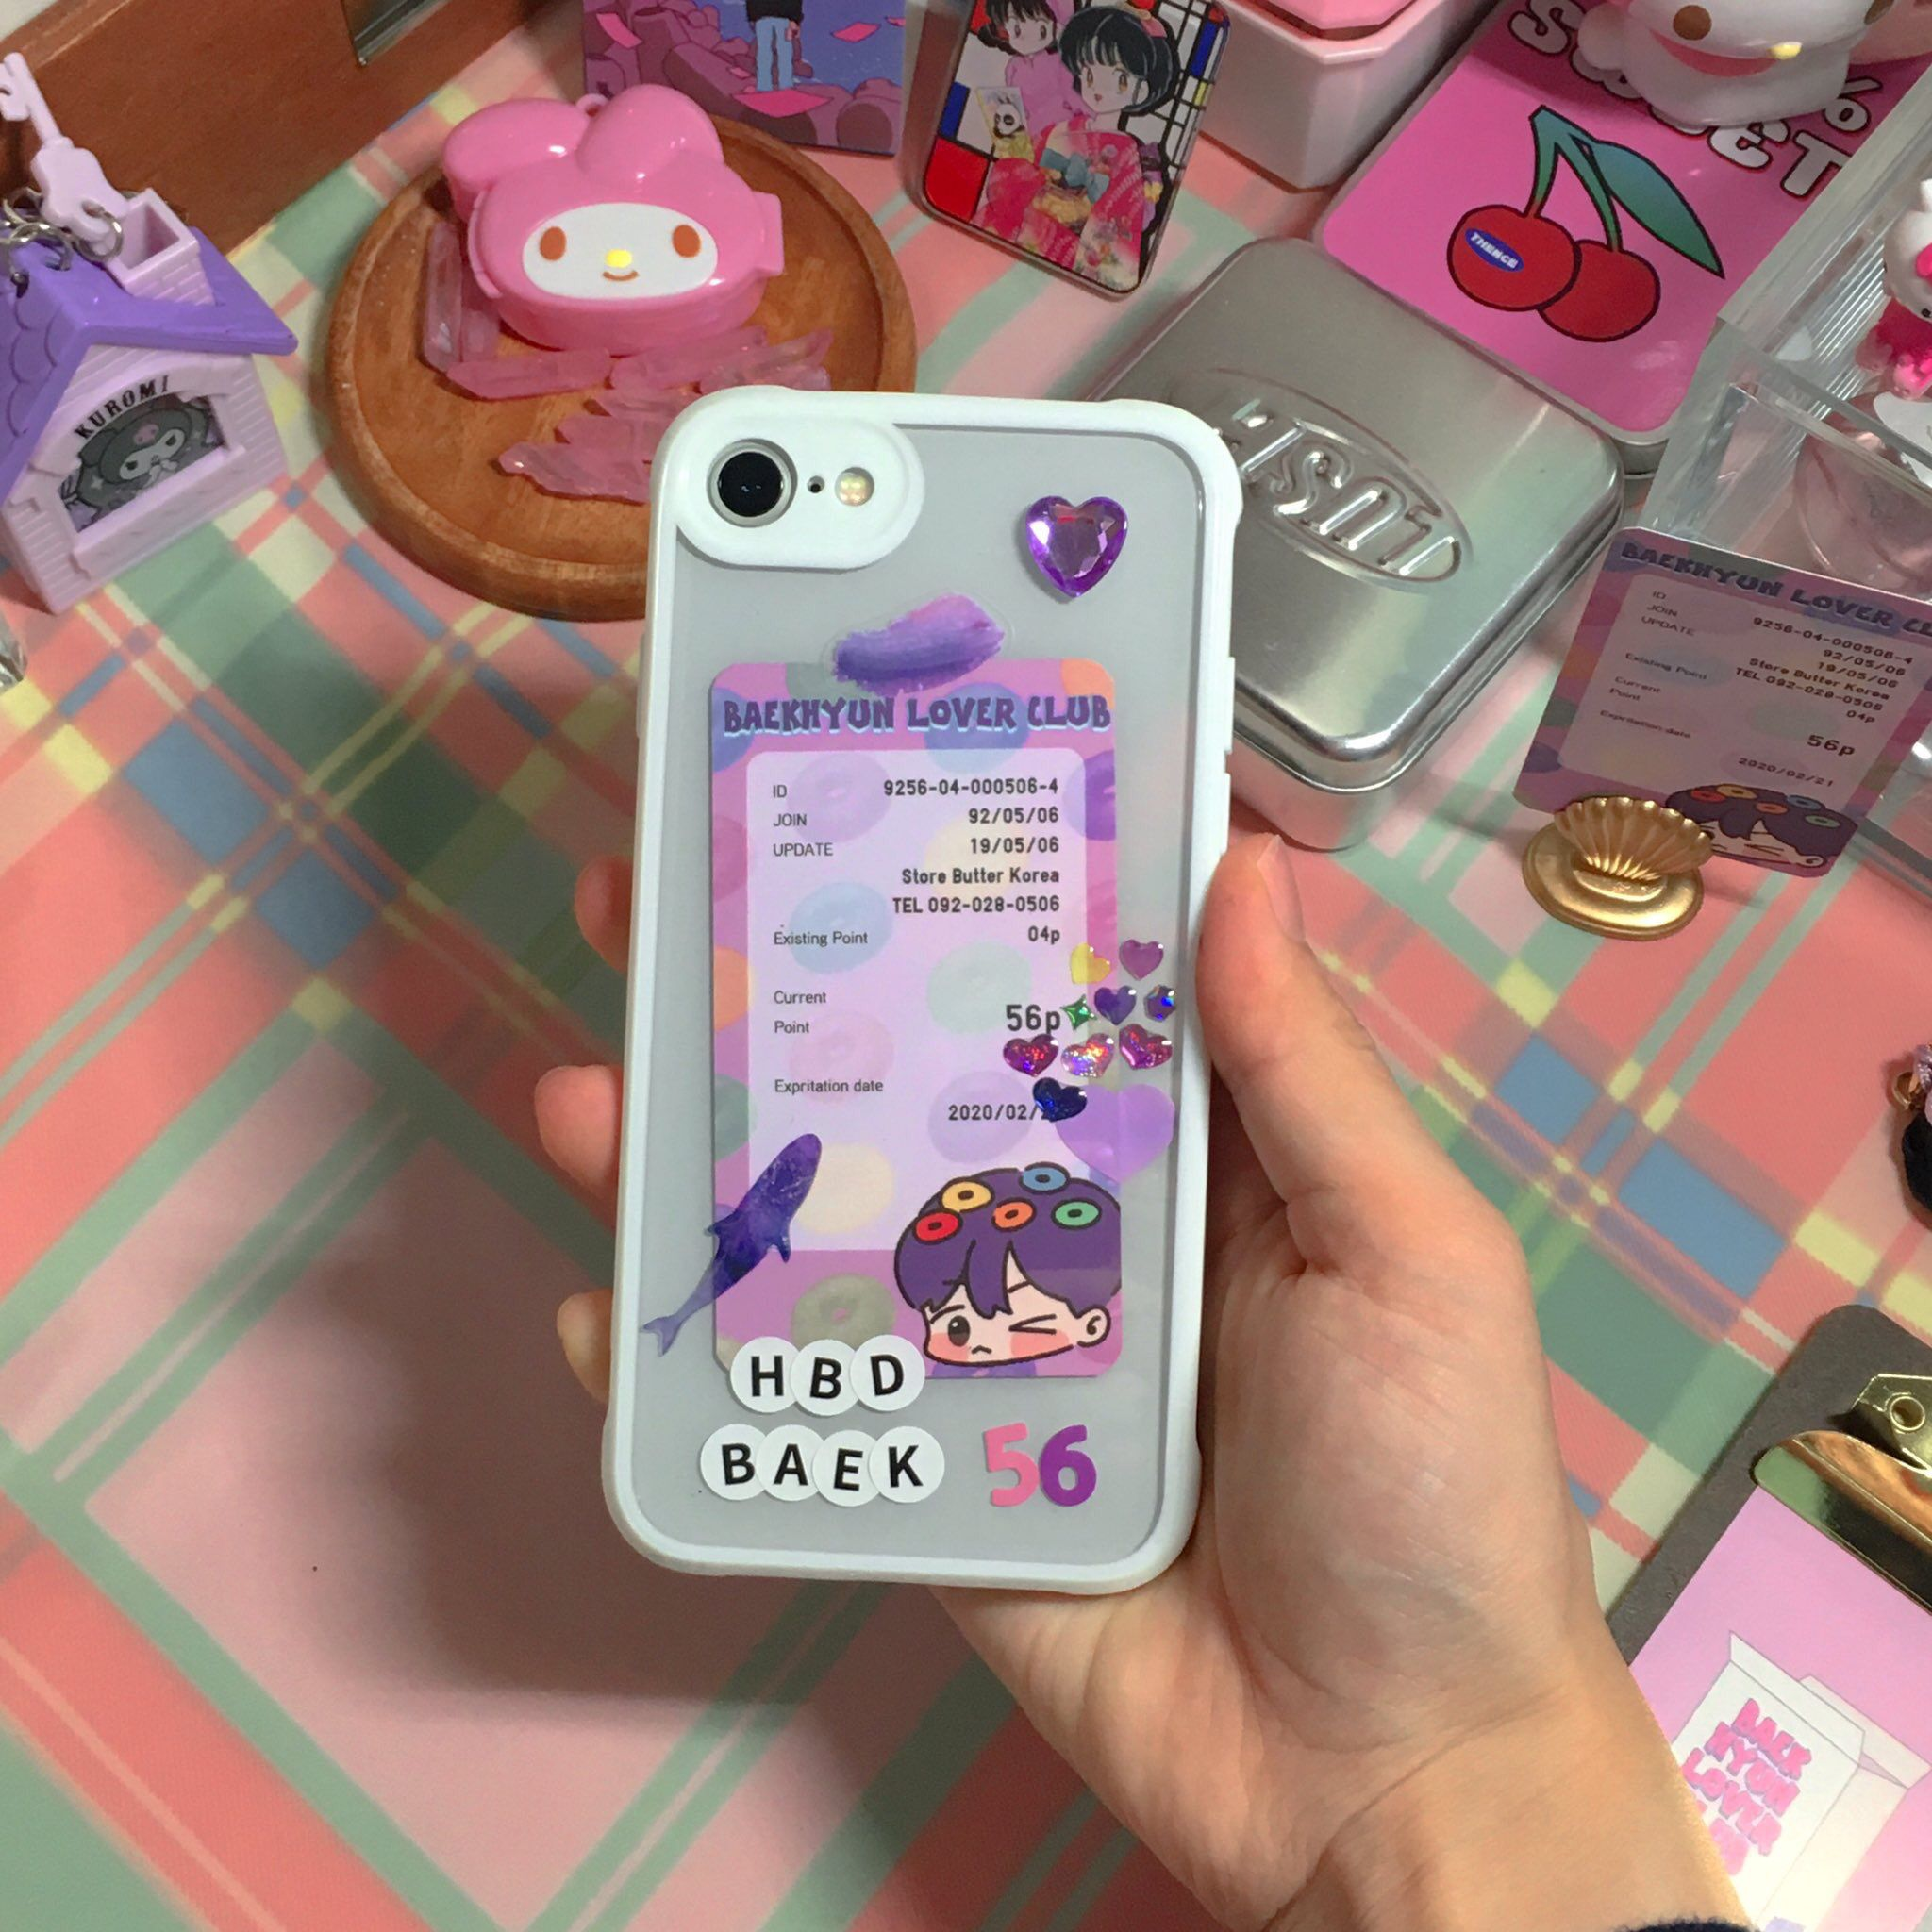 Pin by Tenko on Kpop goods♡ | Kpop phone cases, Pretty ...